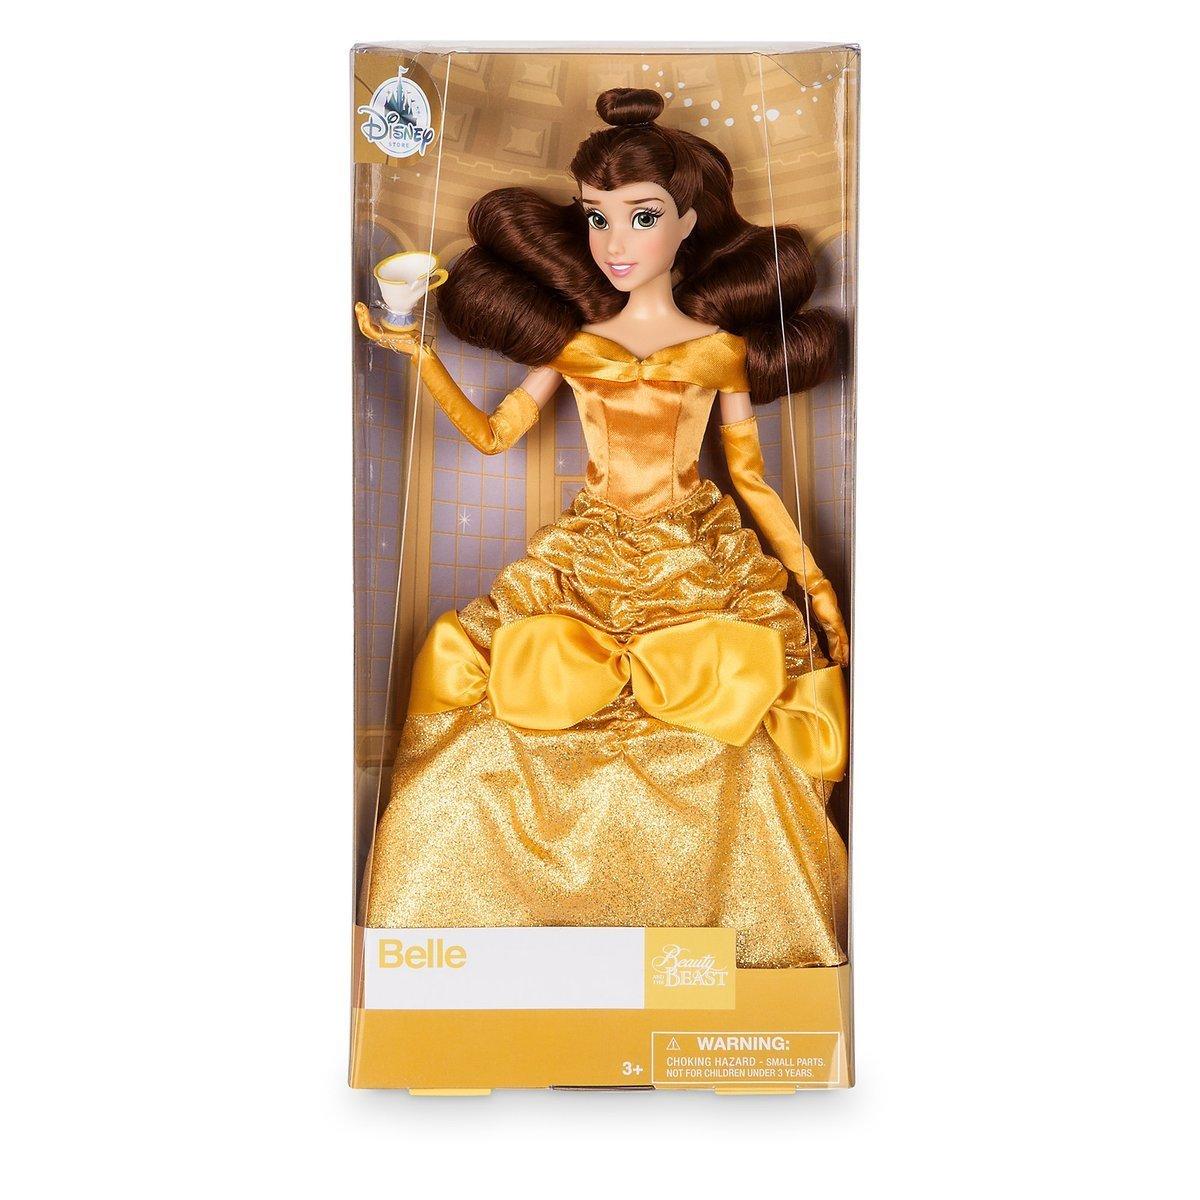 becffb5292 Amazon.com: Disney Store Belle 12